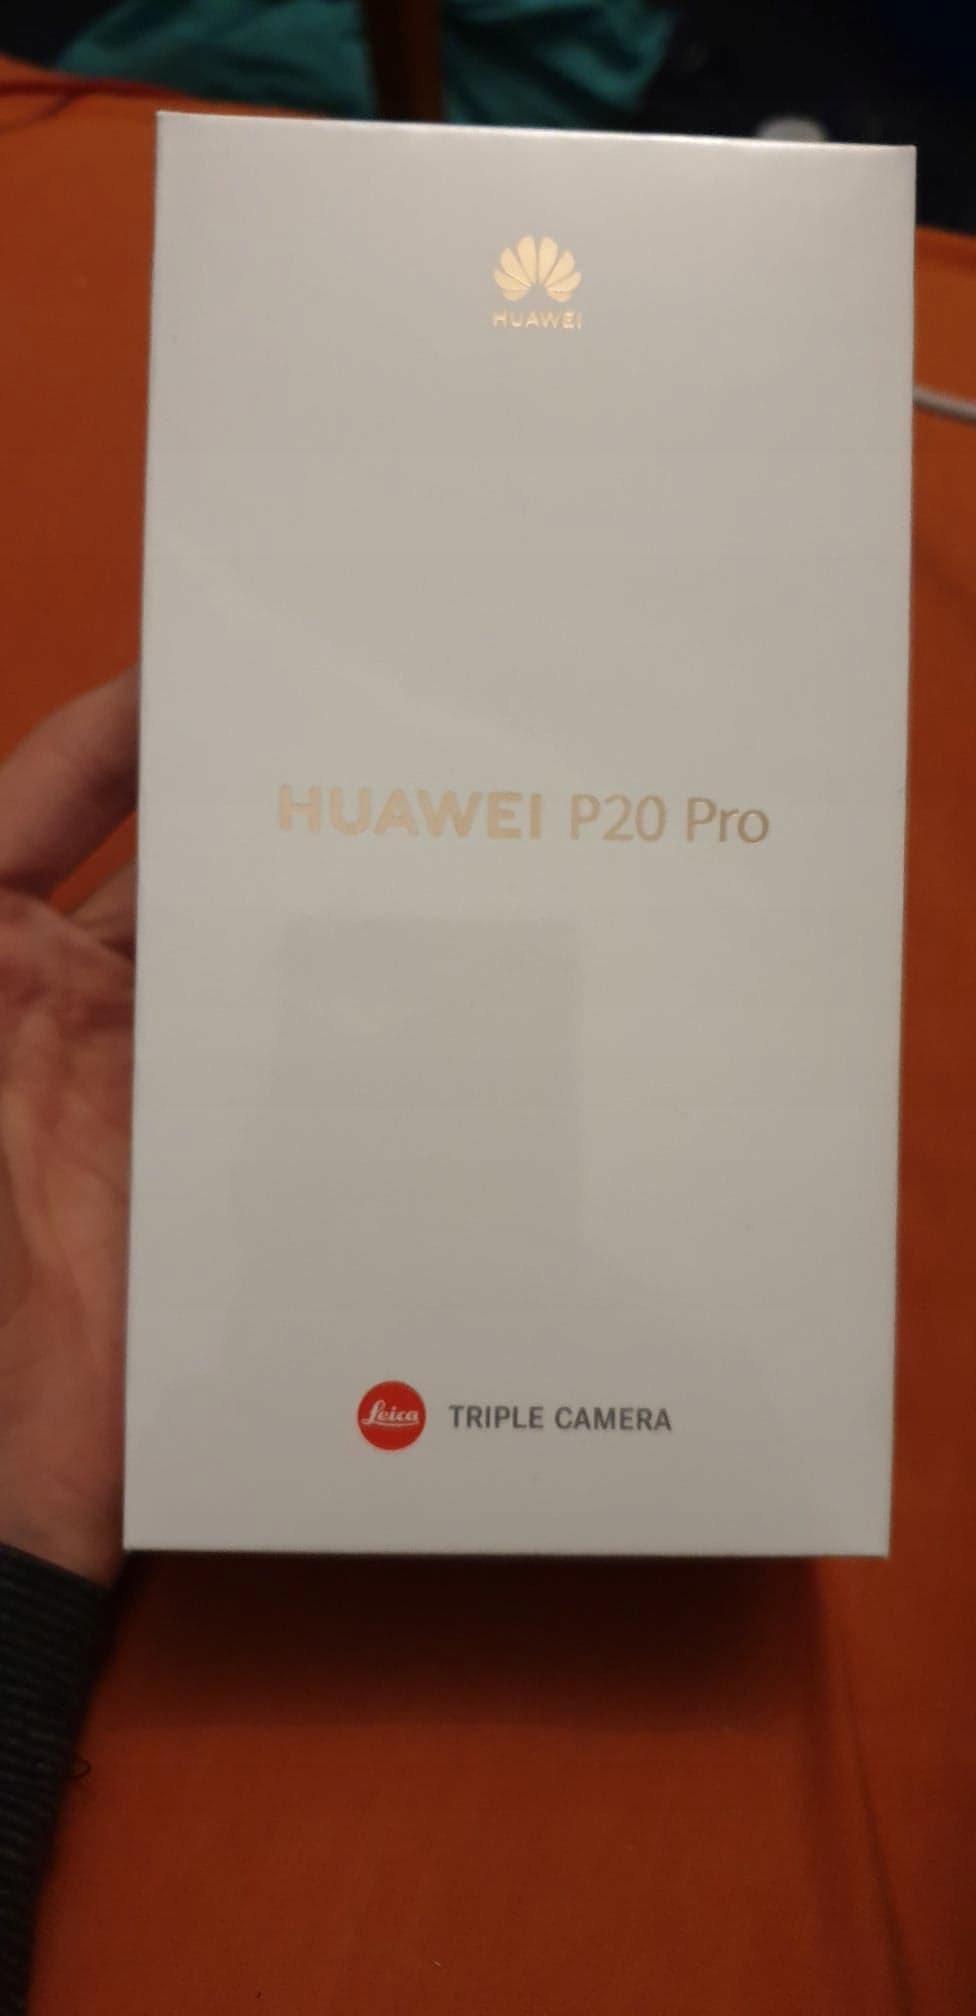 HUAWEI P20 PRO NOWY FIOLET GWAR24M DARMOWA WYSYLKA